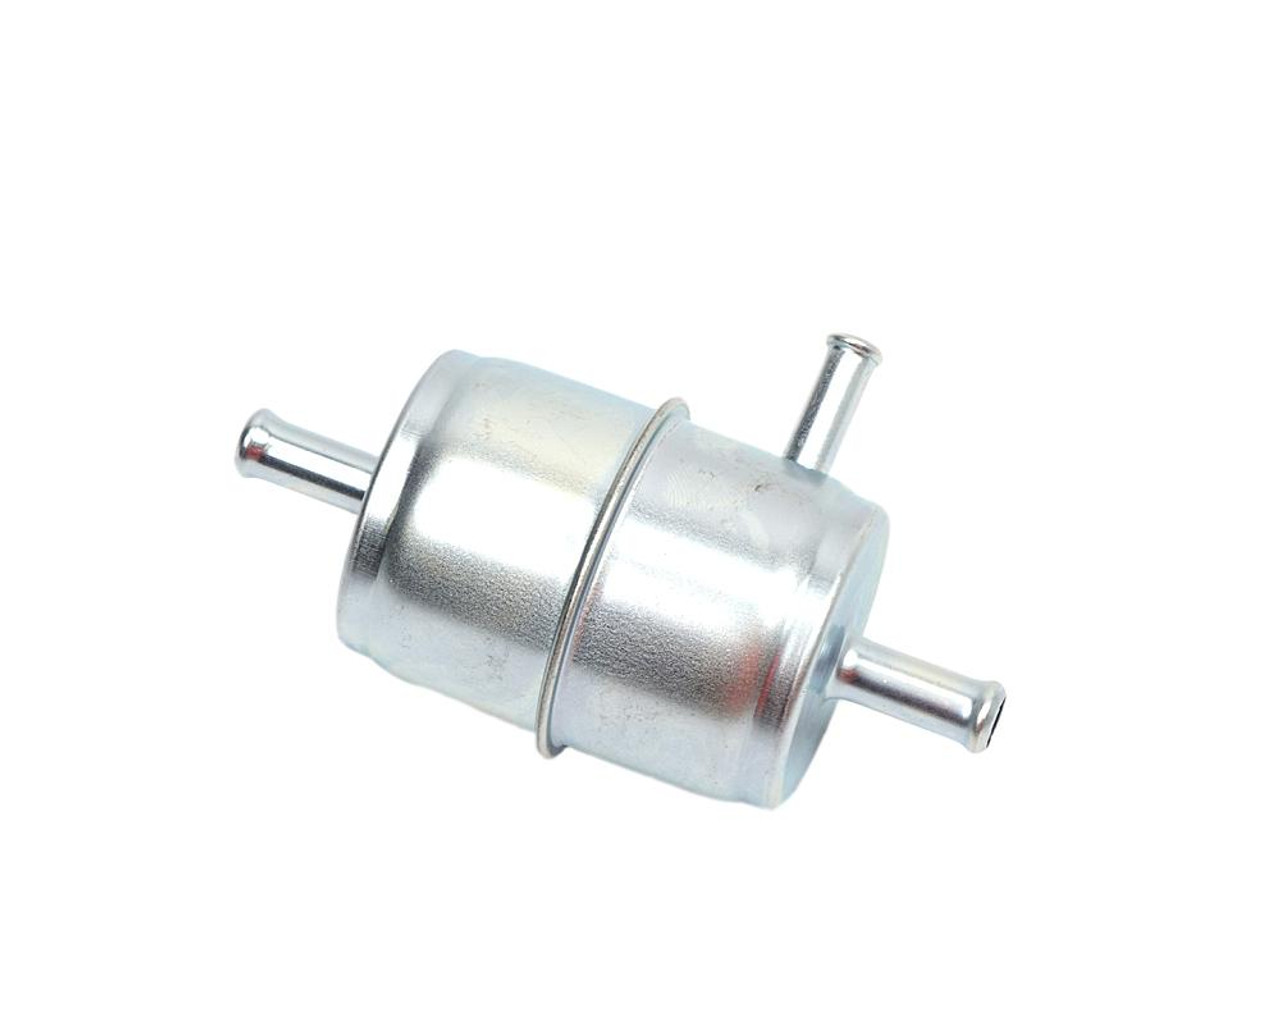 Fuel Filter - Carbureted - with Return Line